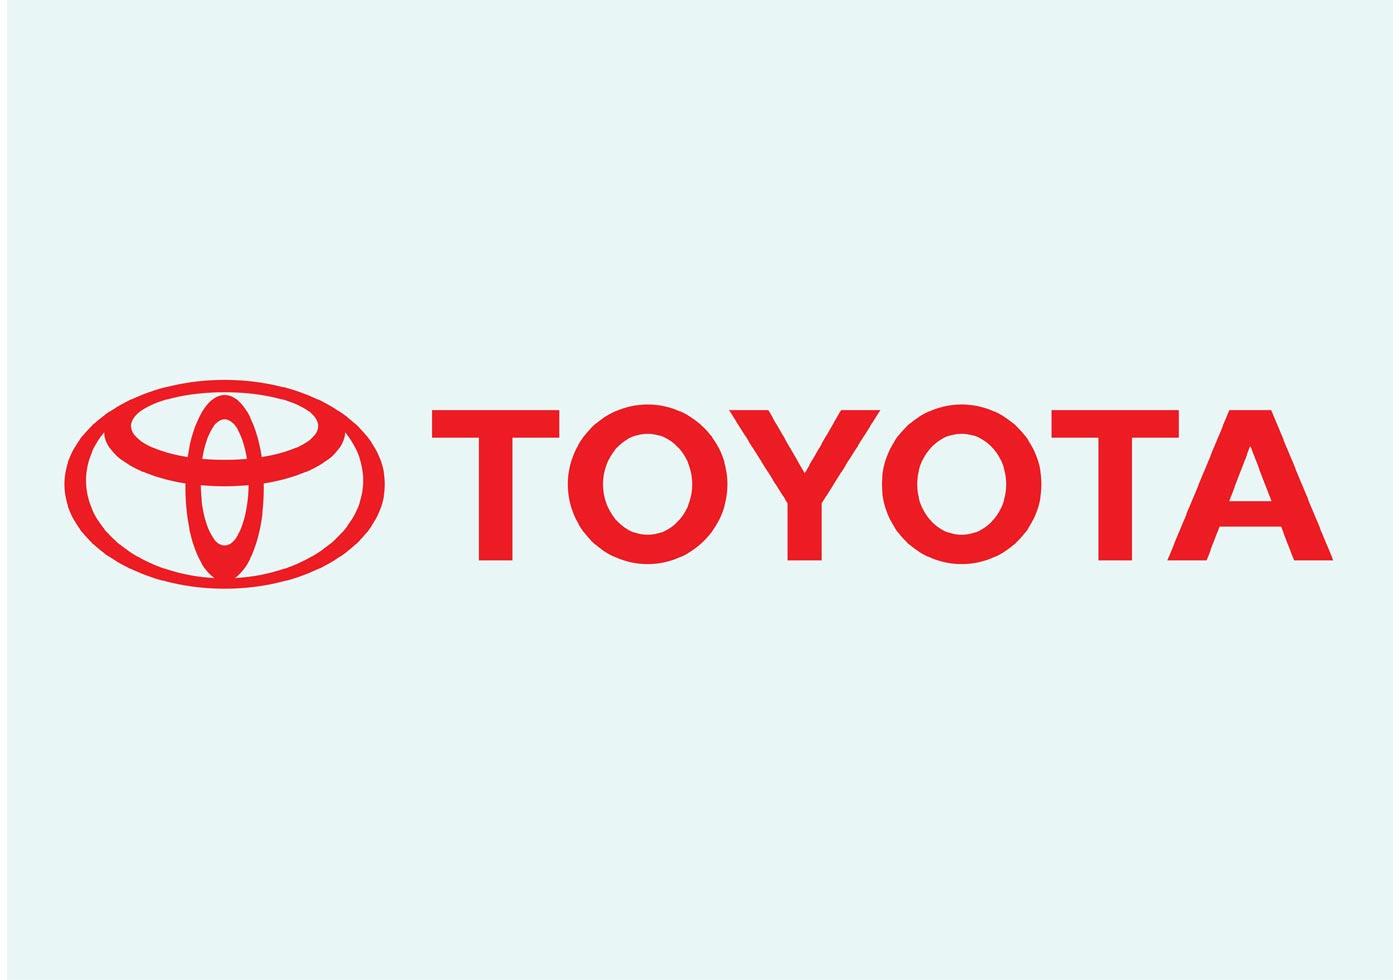 Toyota Vector Logo Download Free Vector Art Stock